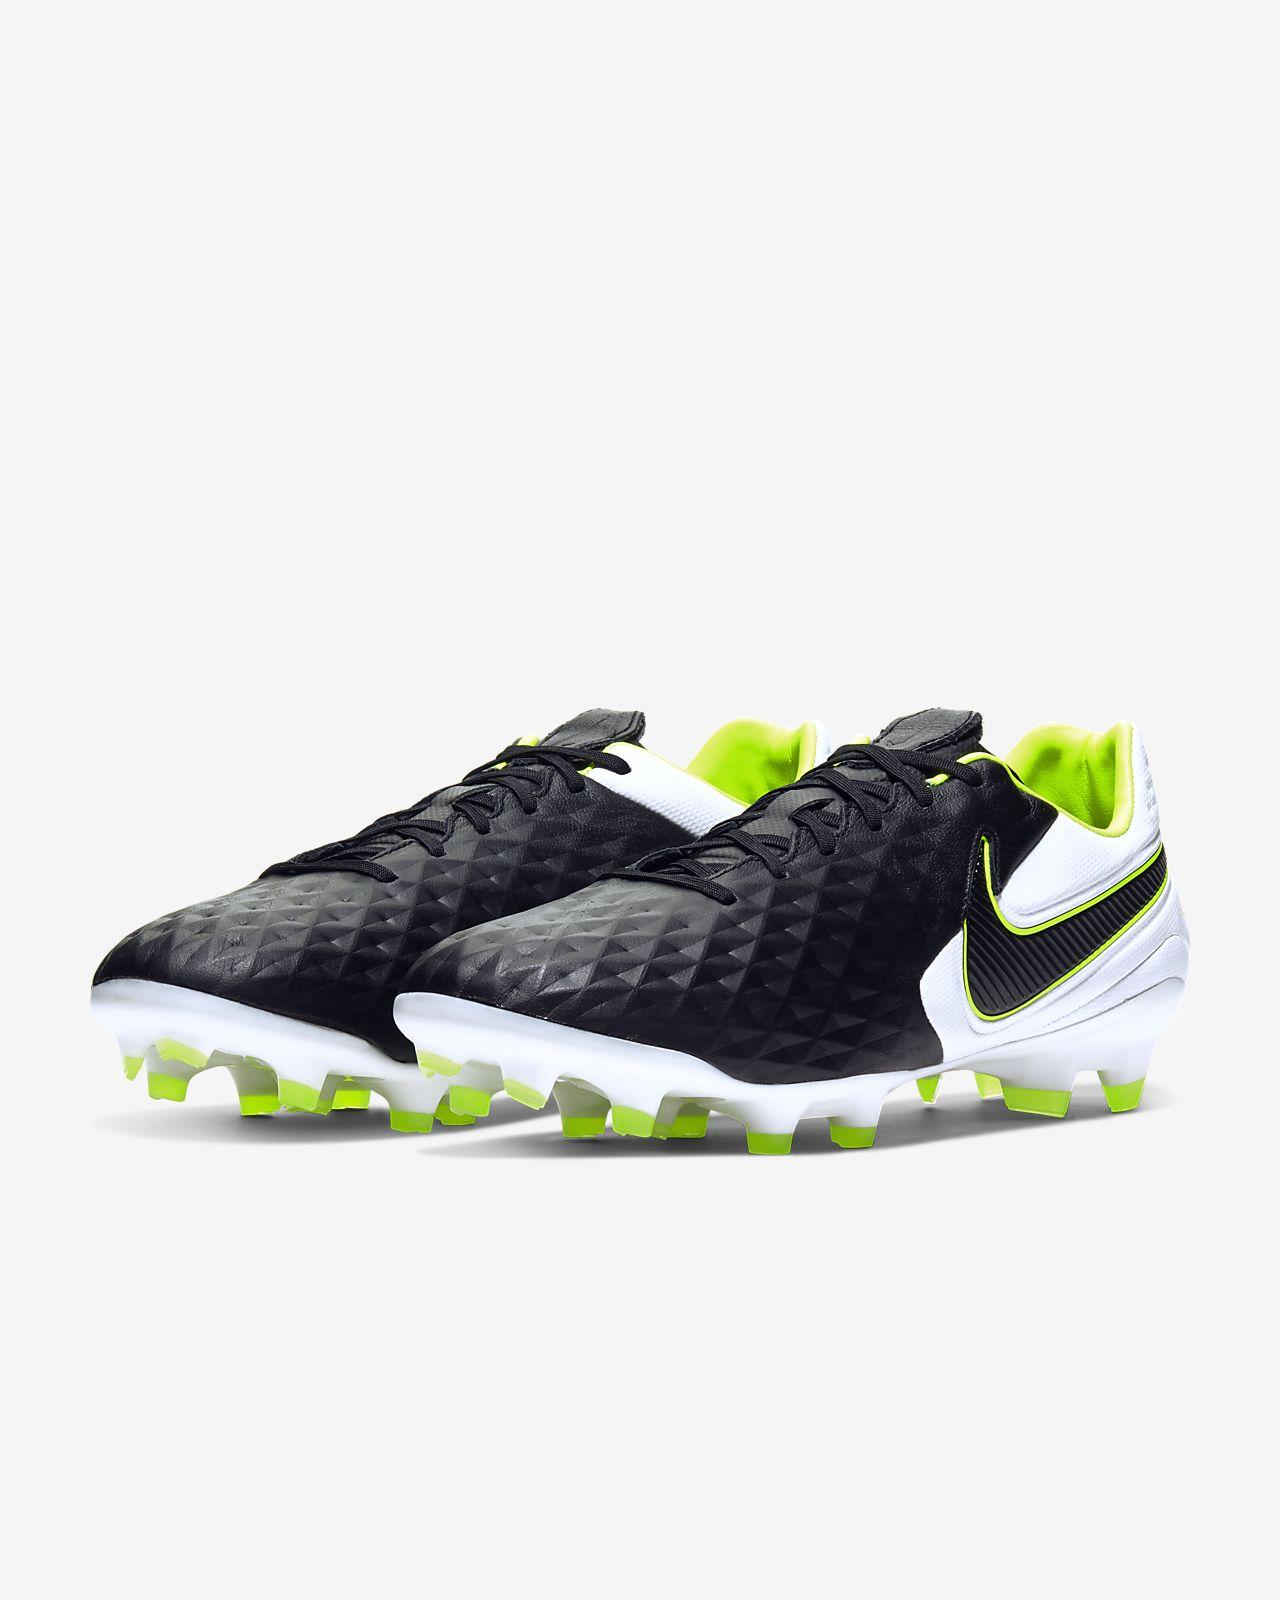 Nike Tiempo Legend 8 Pro FG Under the Radar SoccerPro